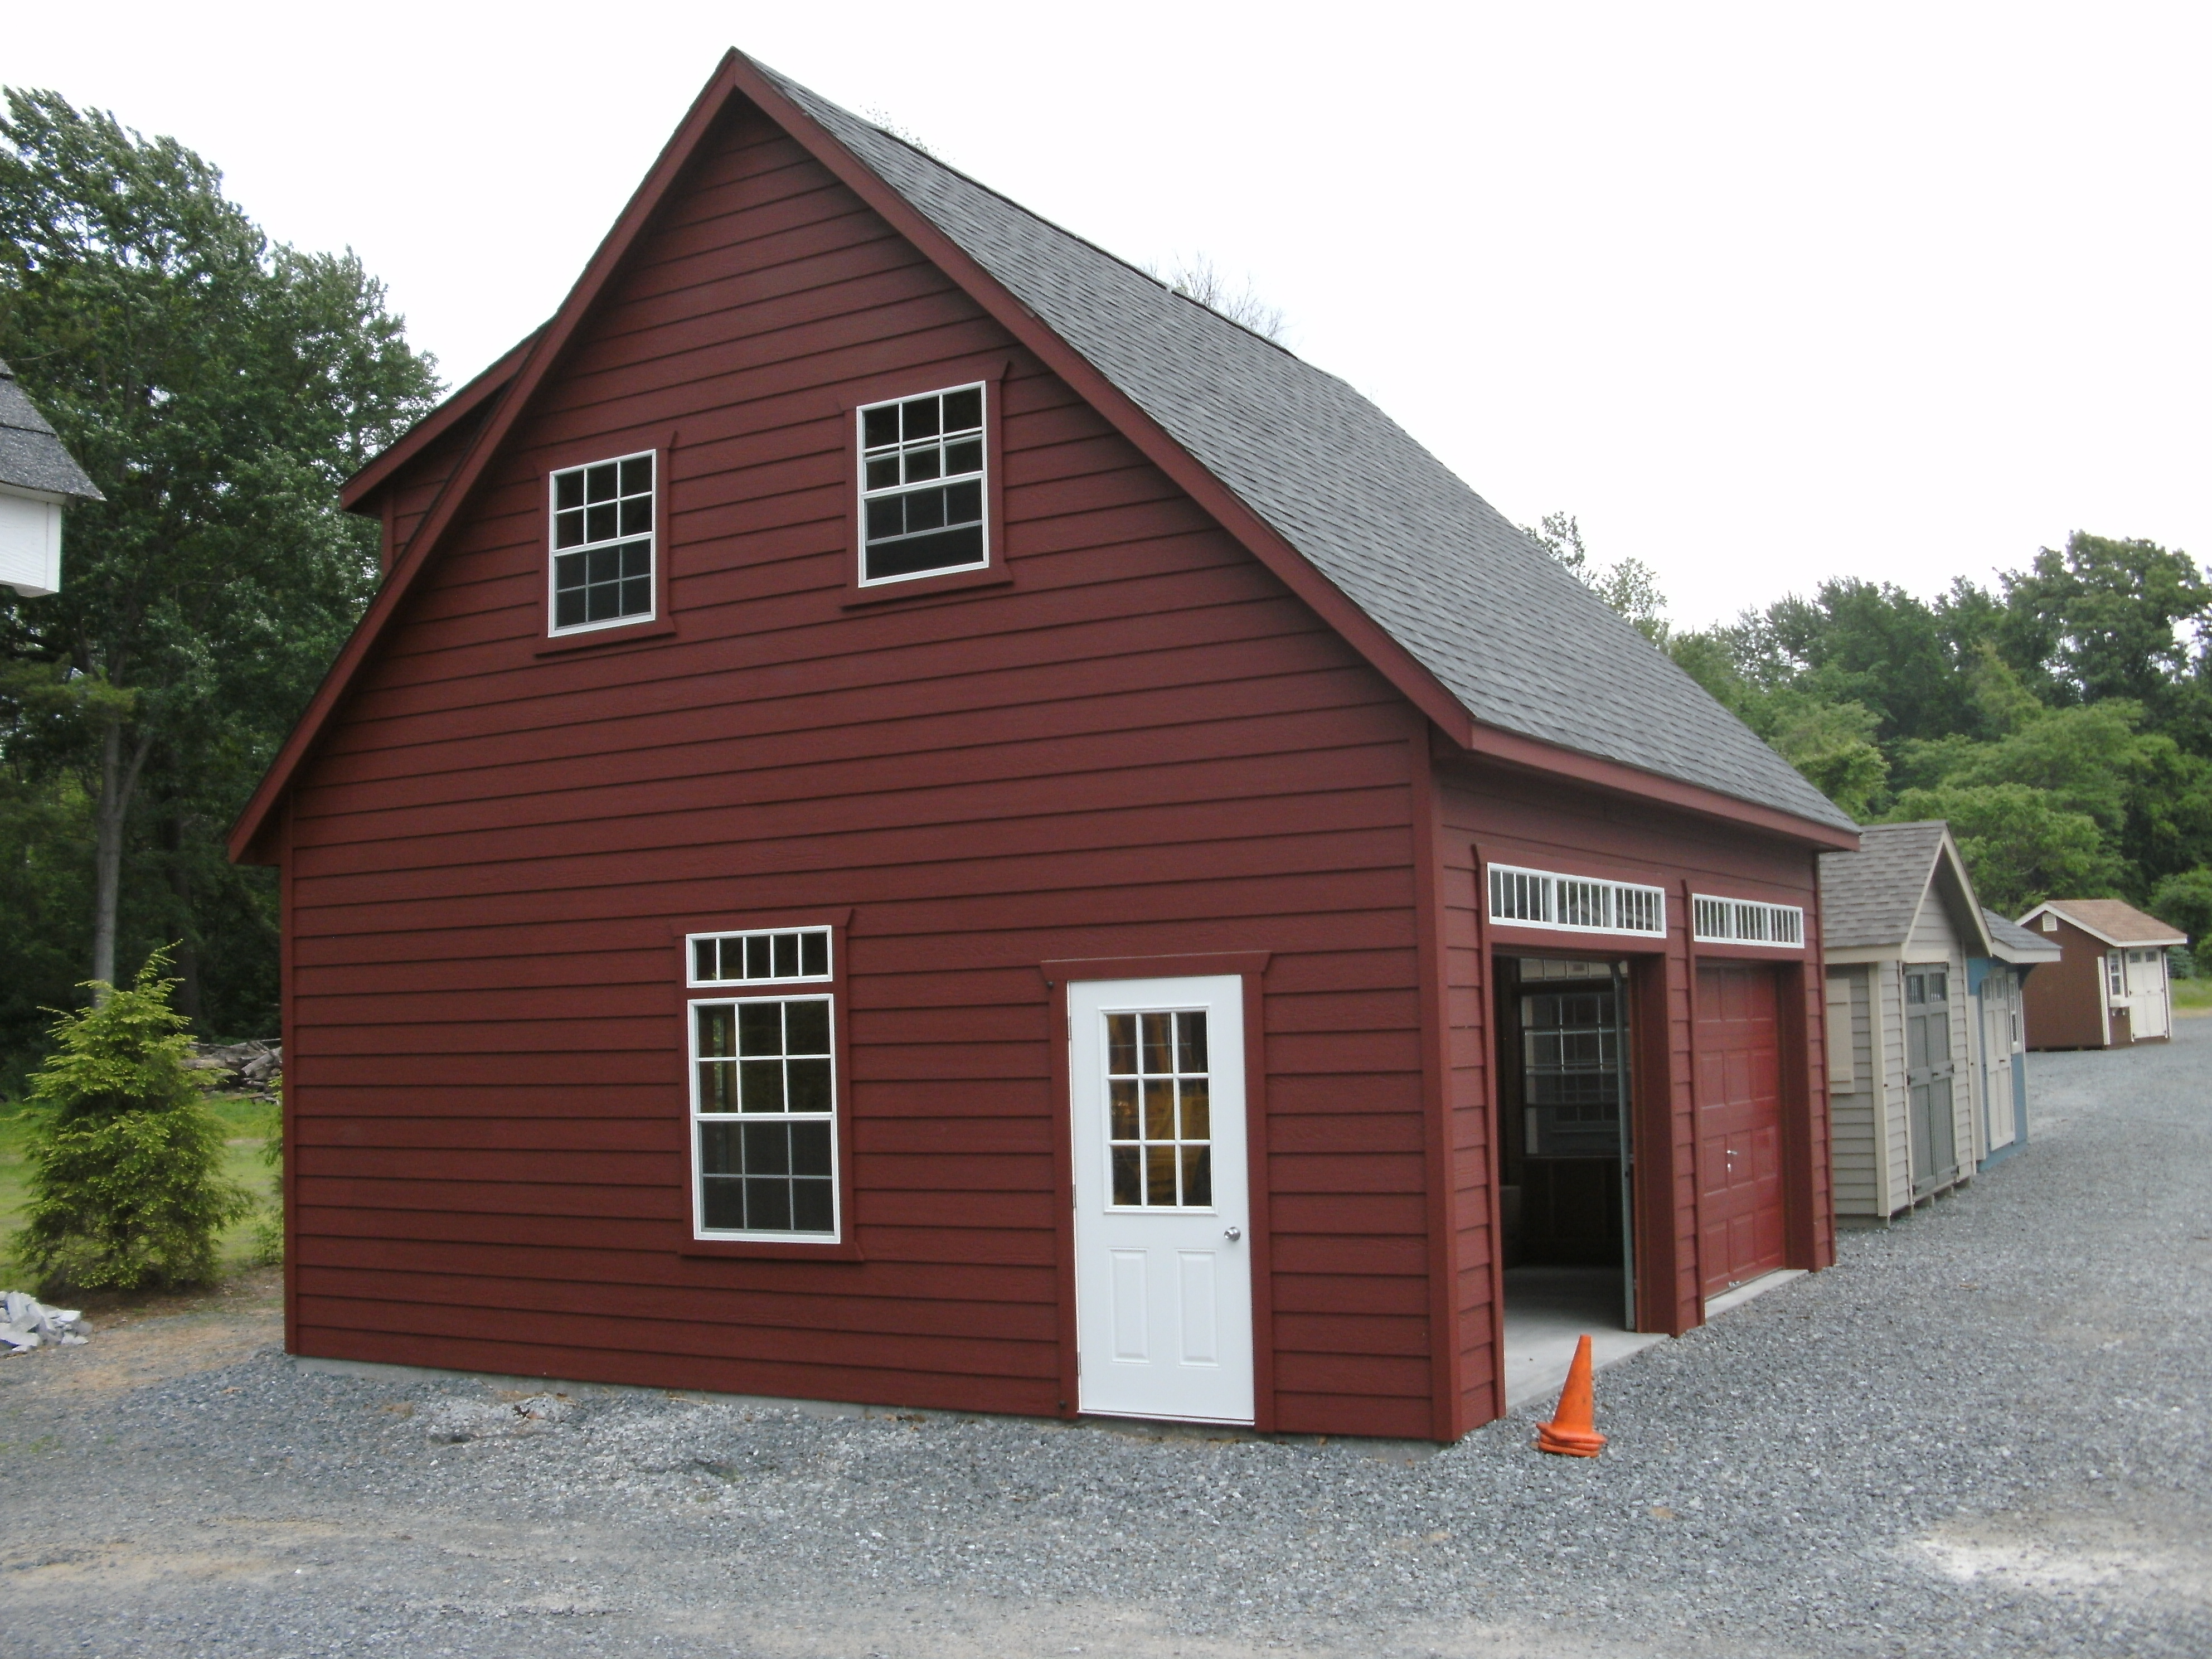 24' X 24' Lp Smartside Garage : Image 5